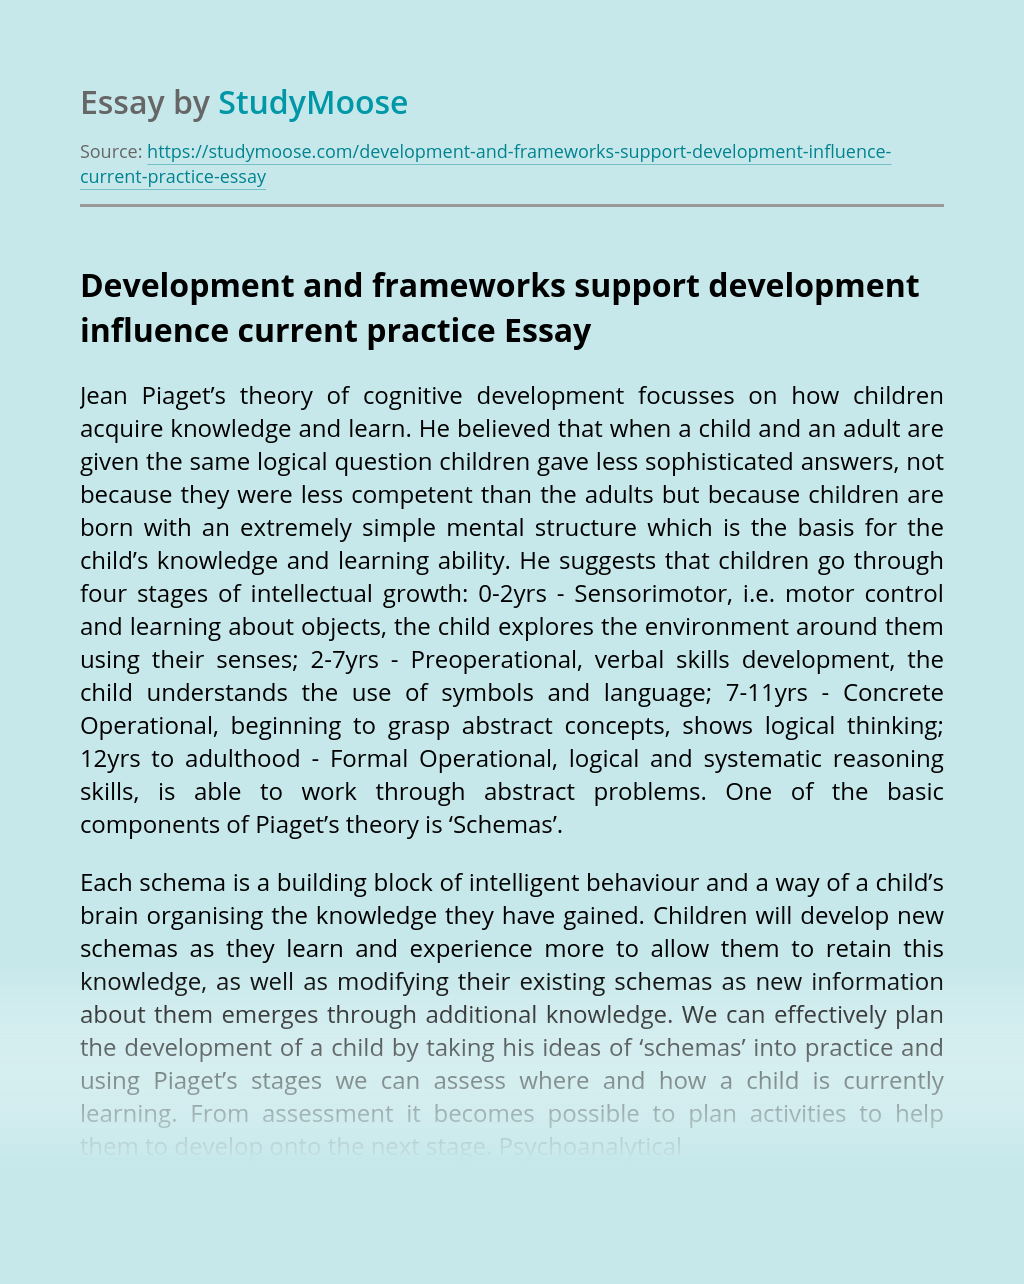 Development and frameworks support development influence current practice